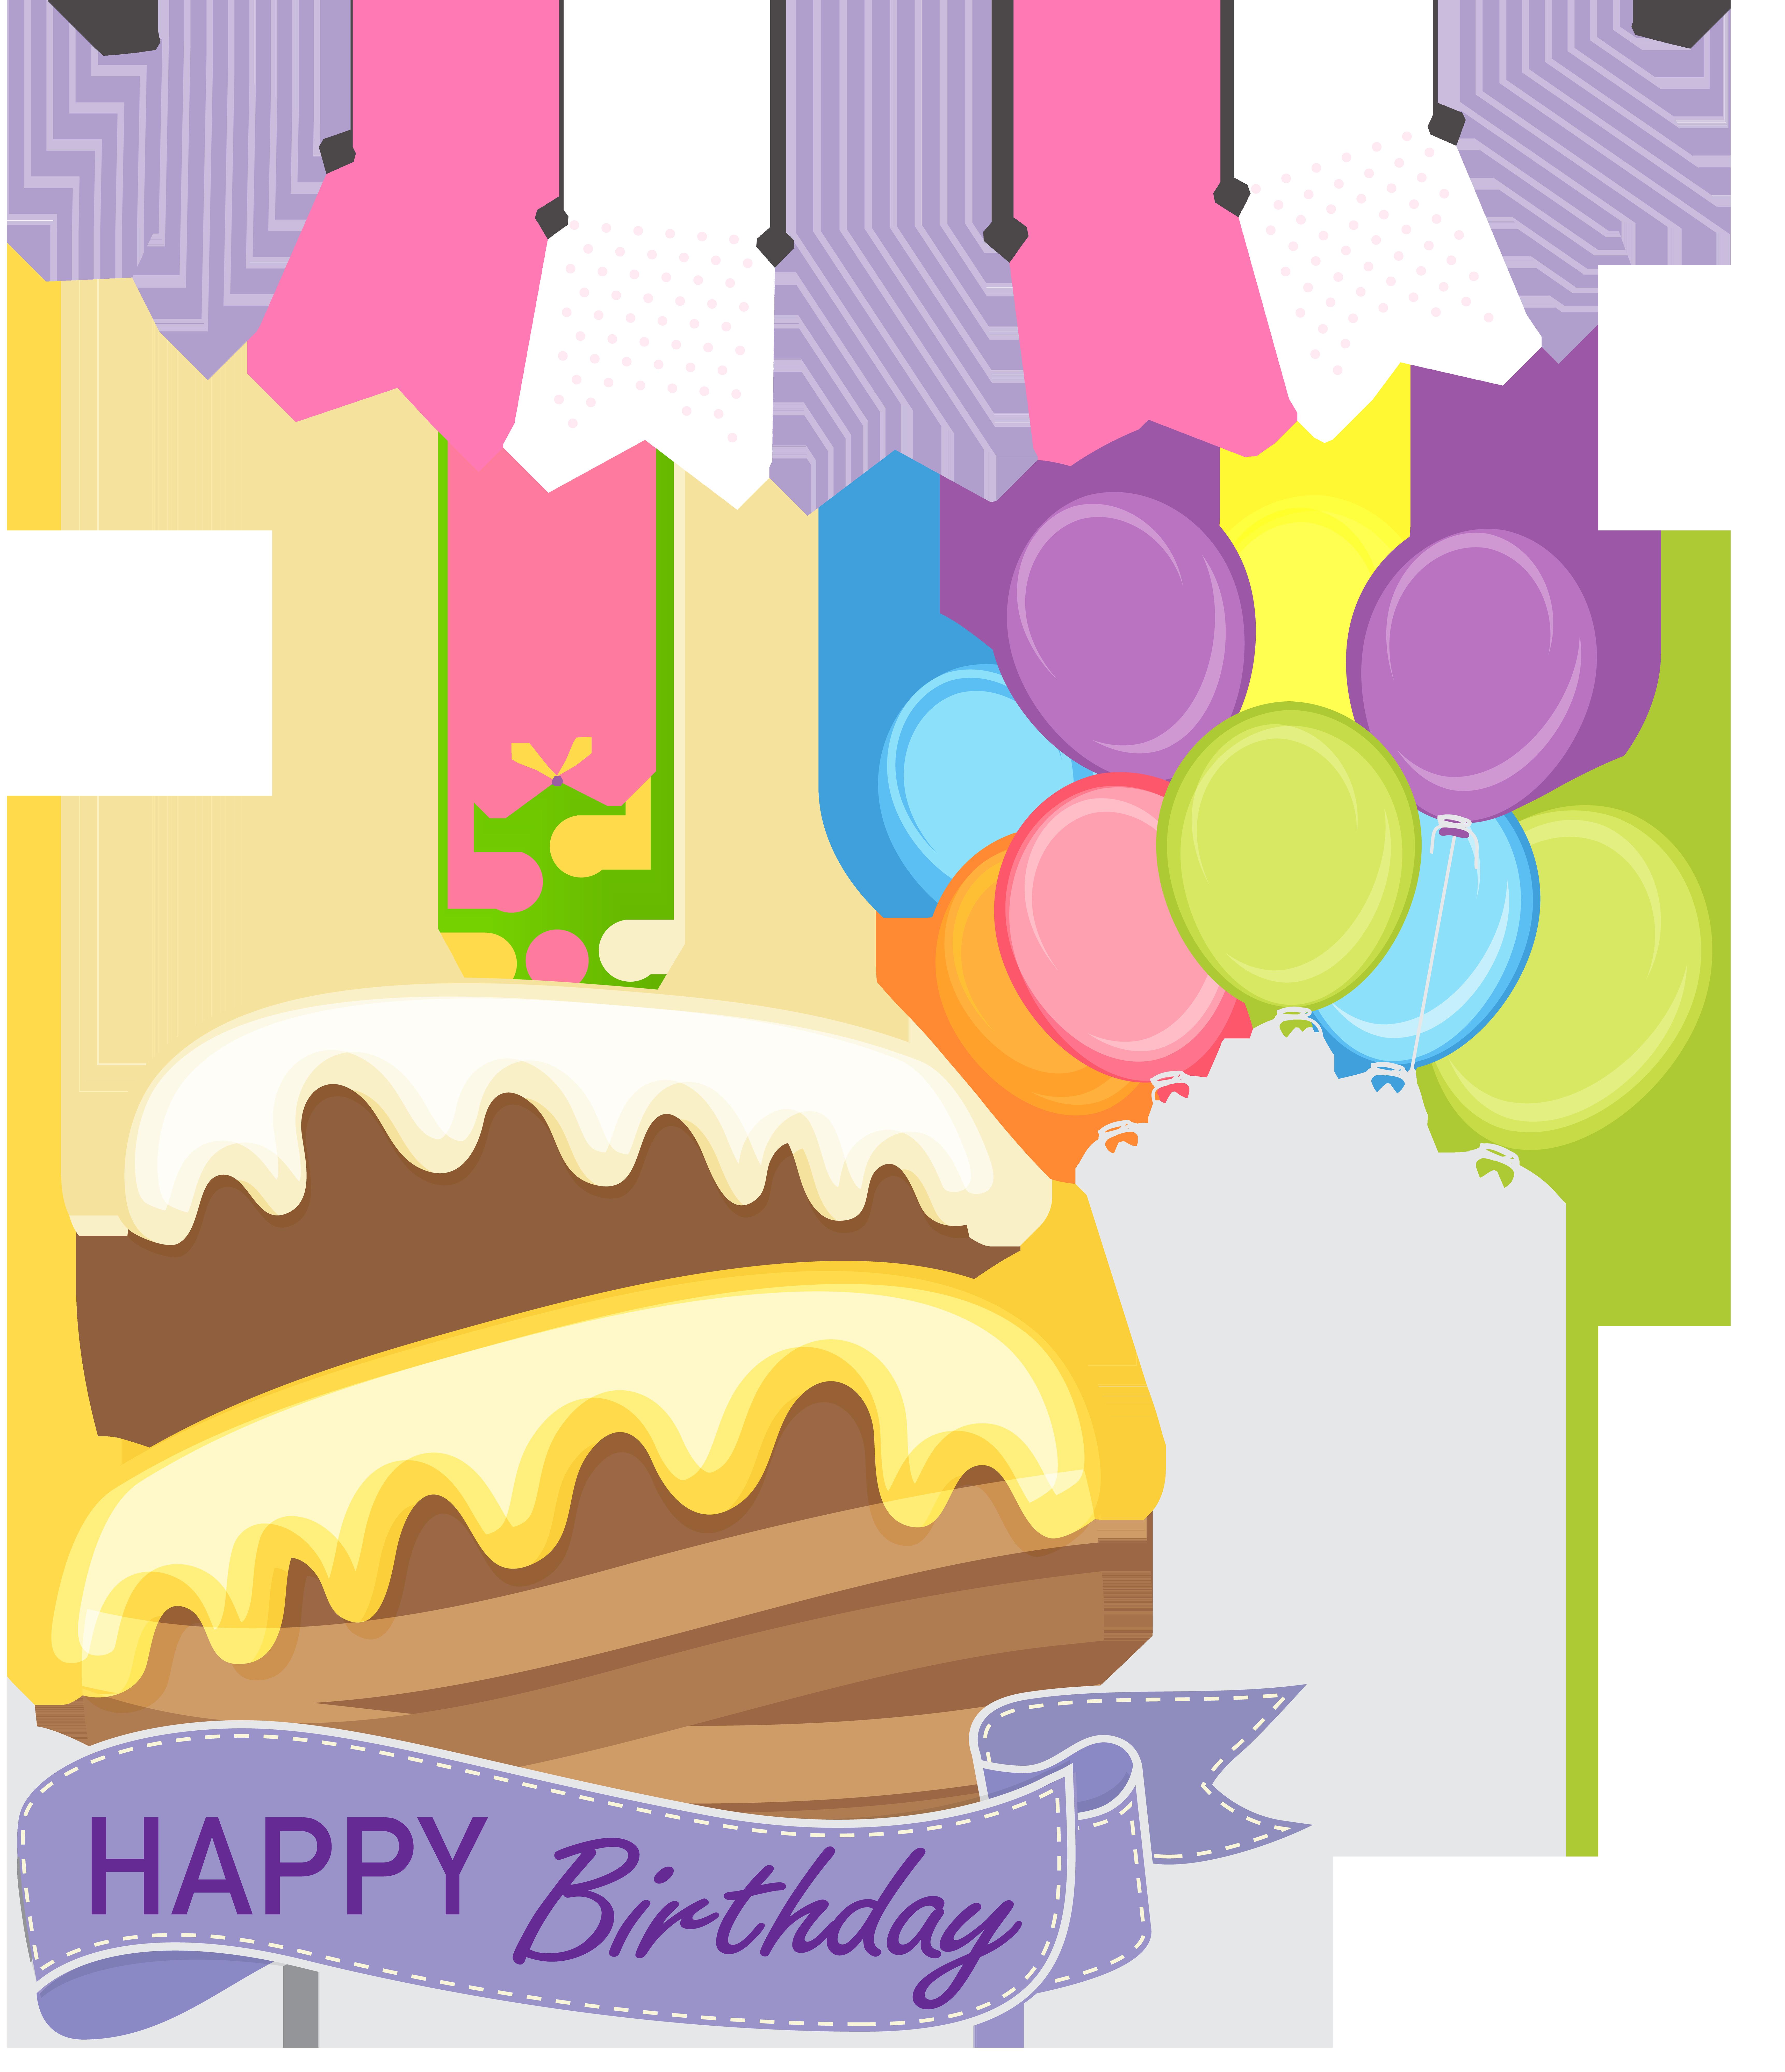 Happy birthday cake png. Dessert clipart purple